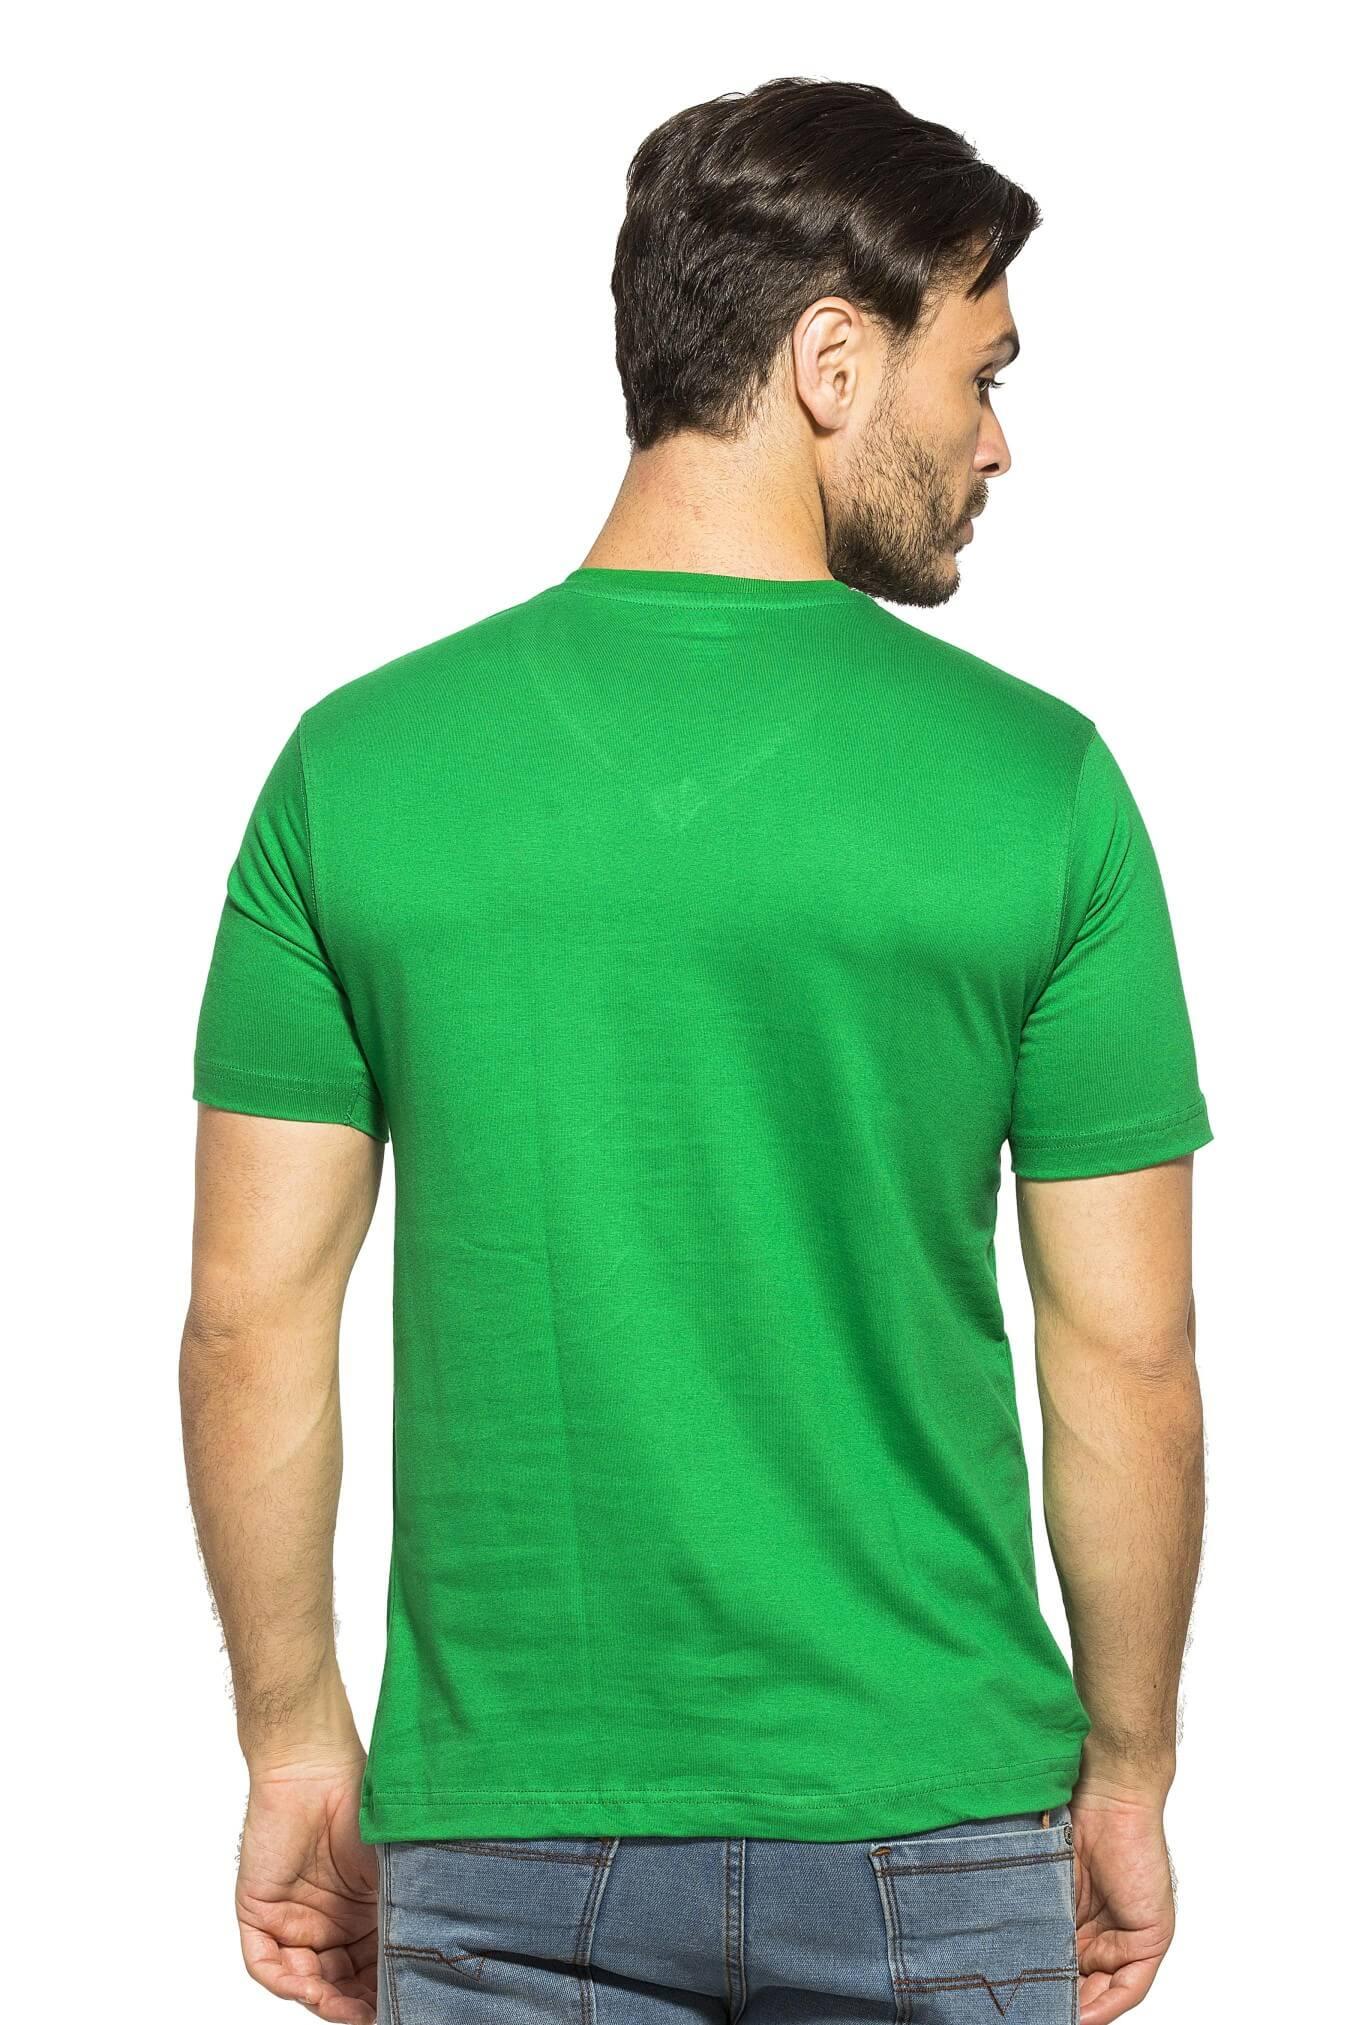 ac0823992 Buy Dark Green Plain V Neck Half Sleeve T-Shirt products online